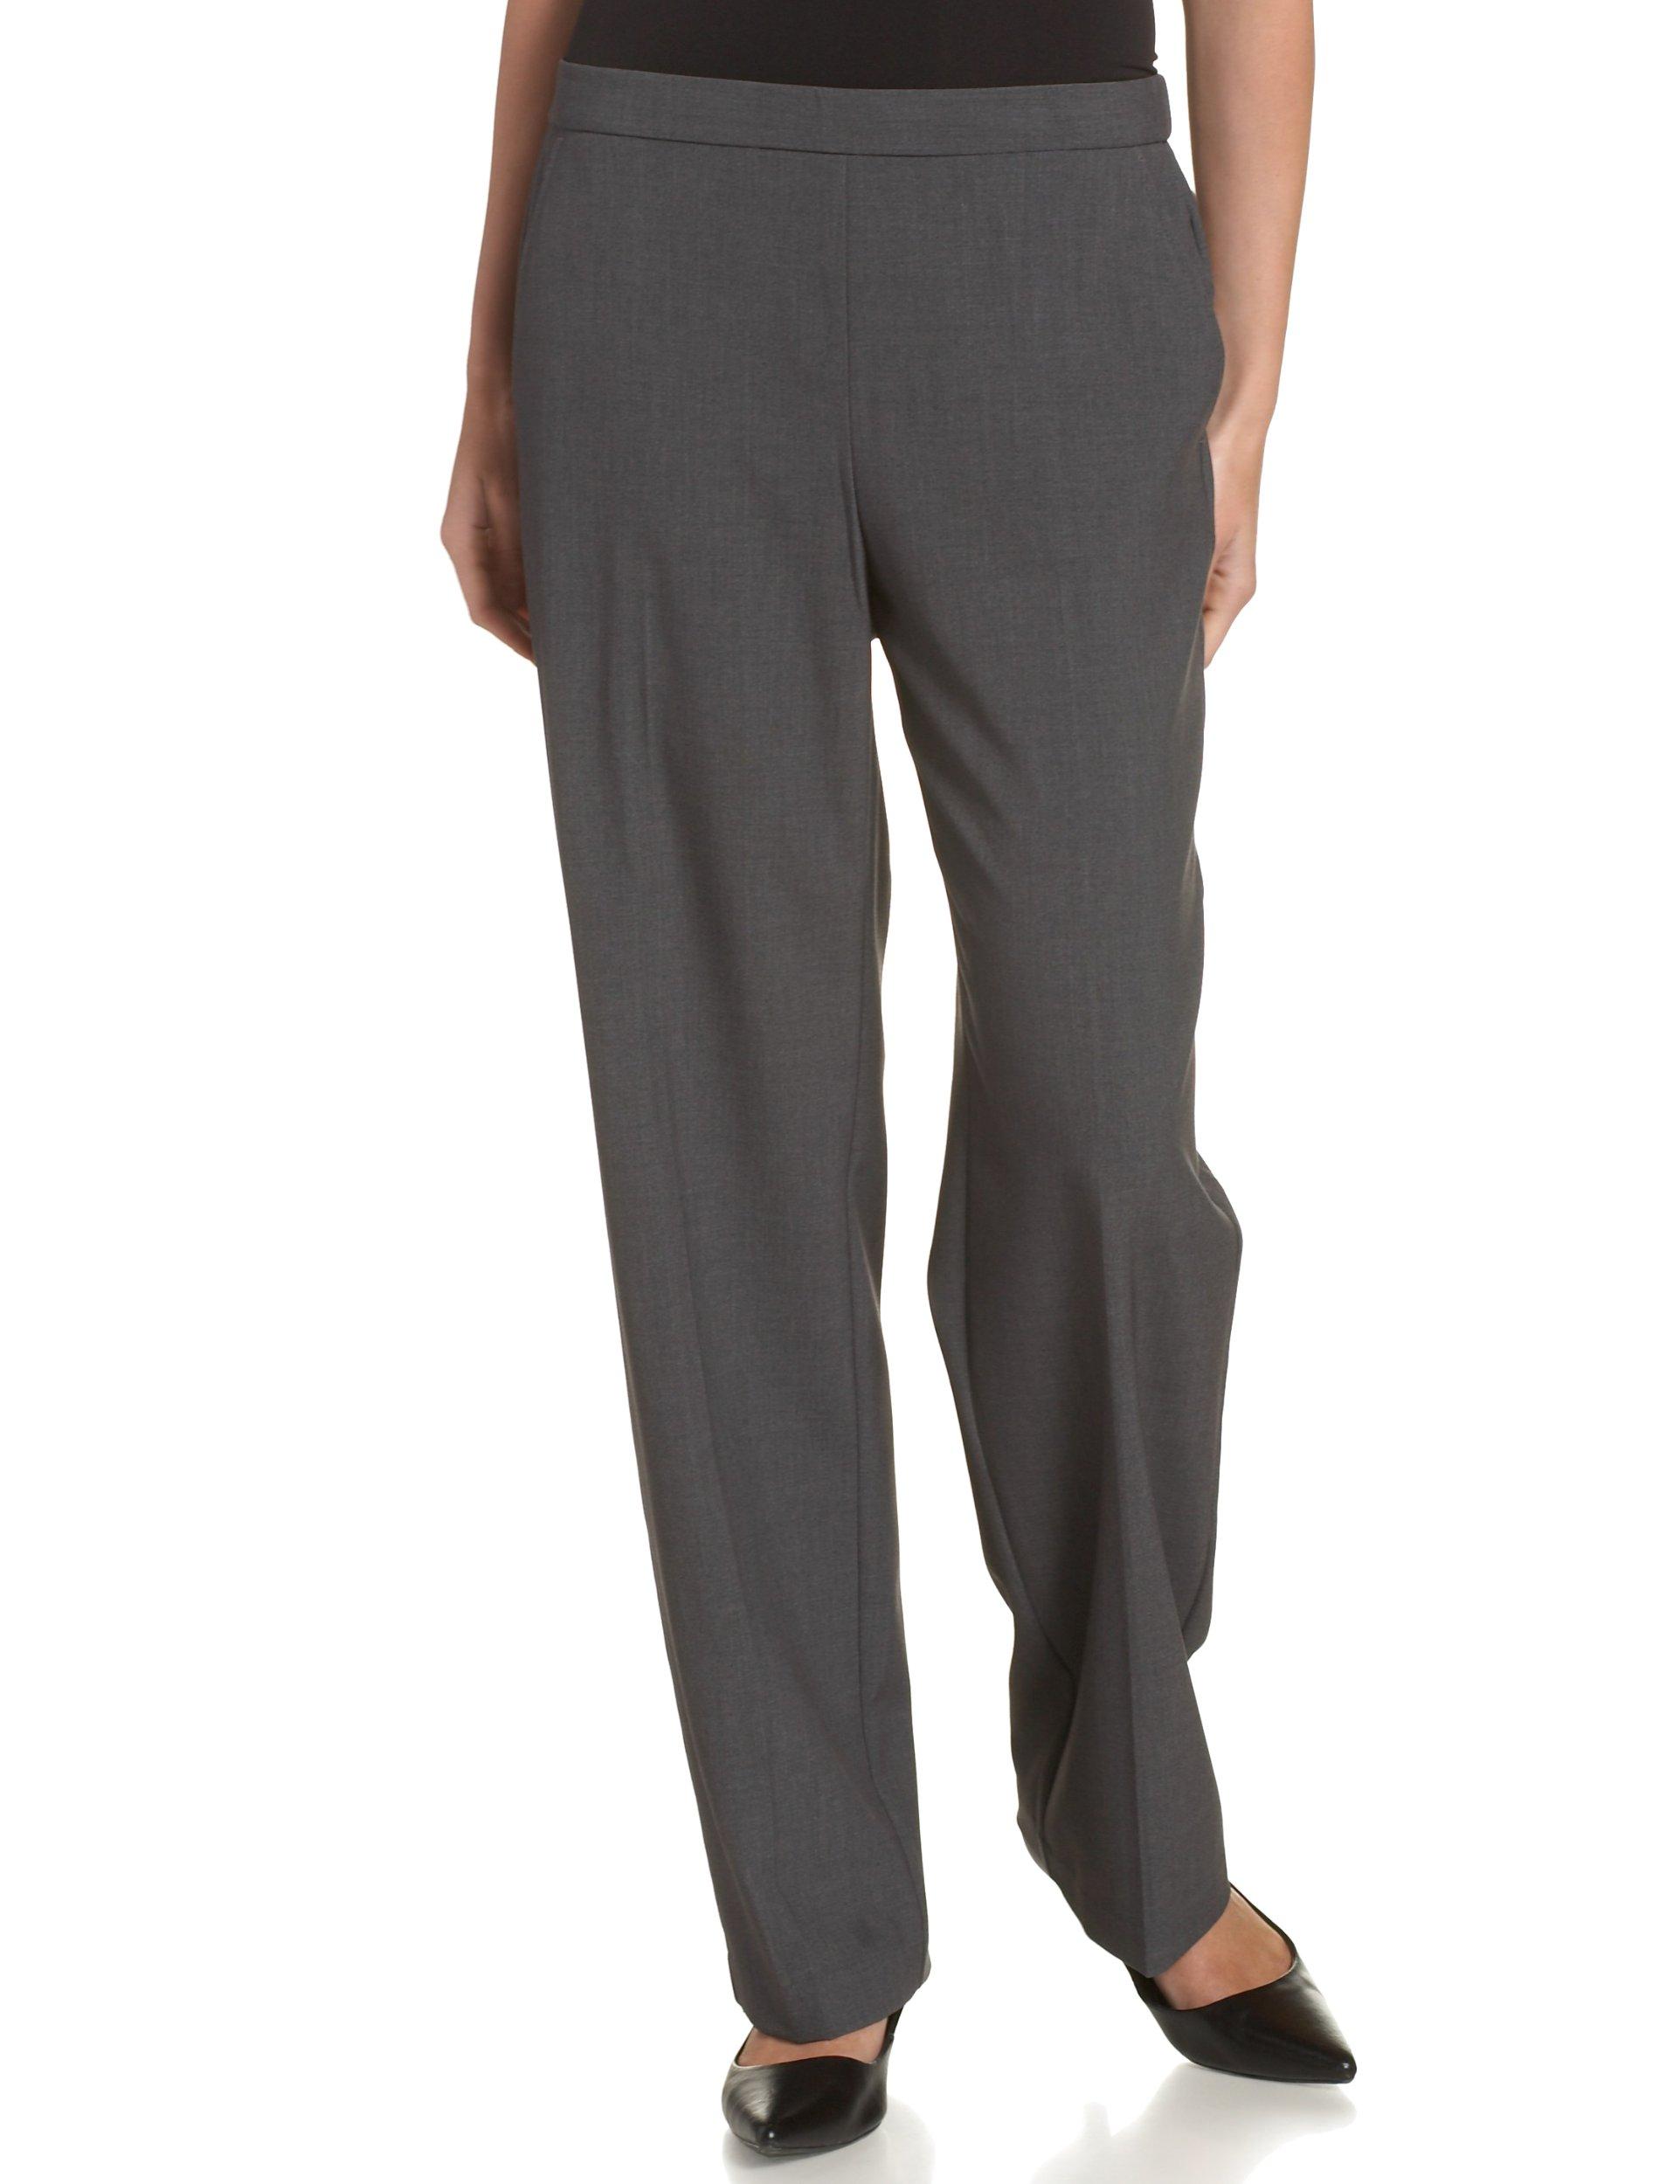 Briggs New York Women's All Around Comfort Pant,Heather Grey,12P